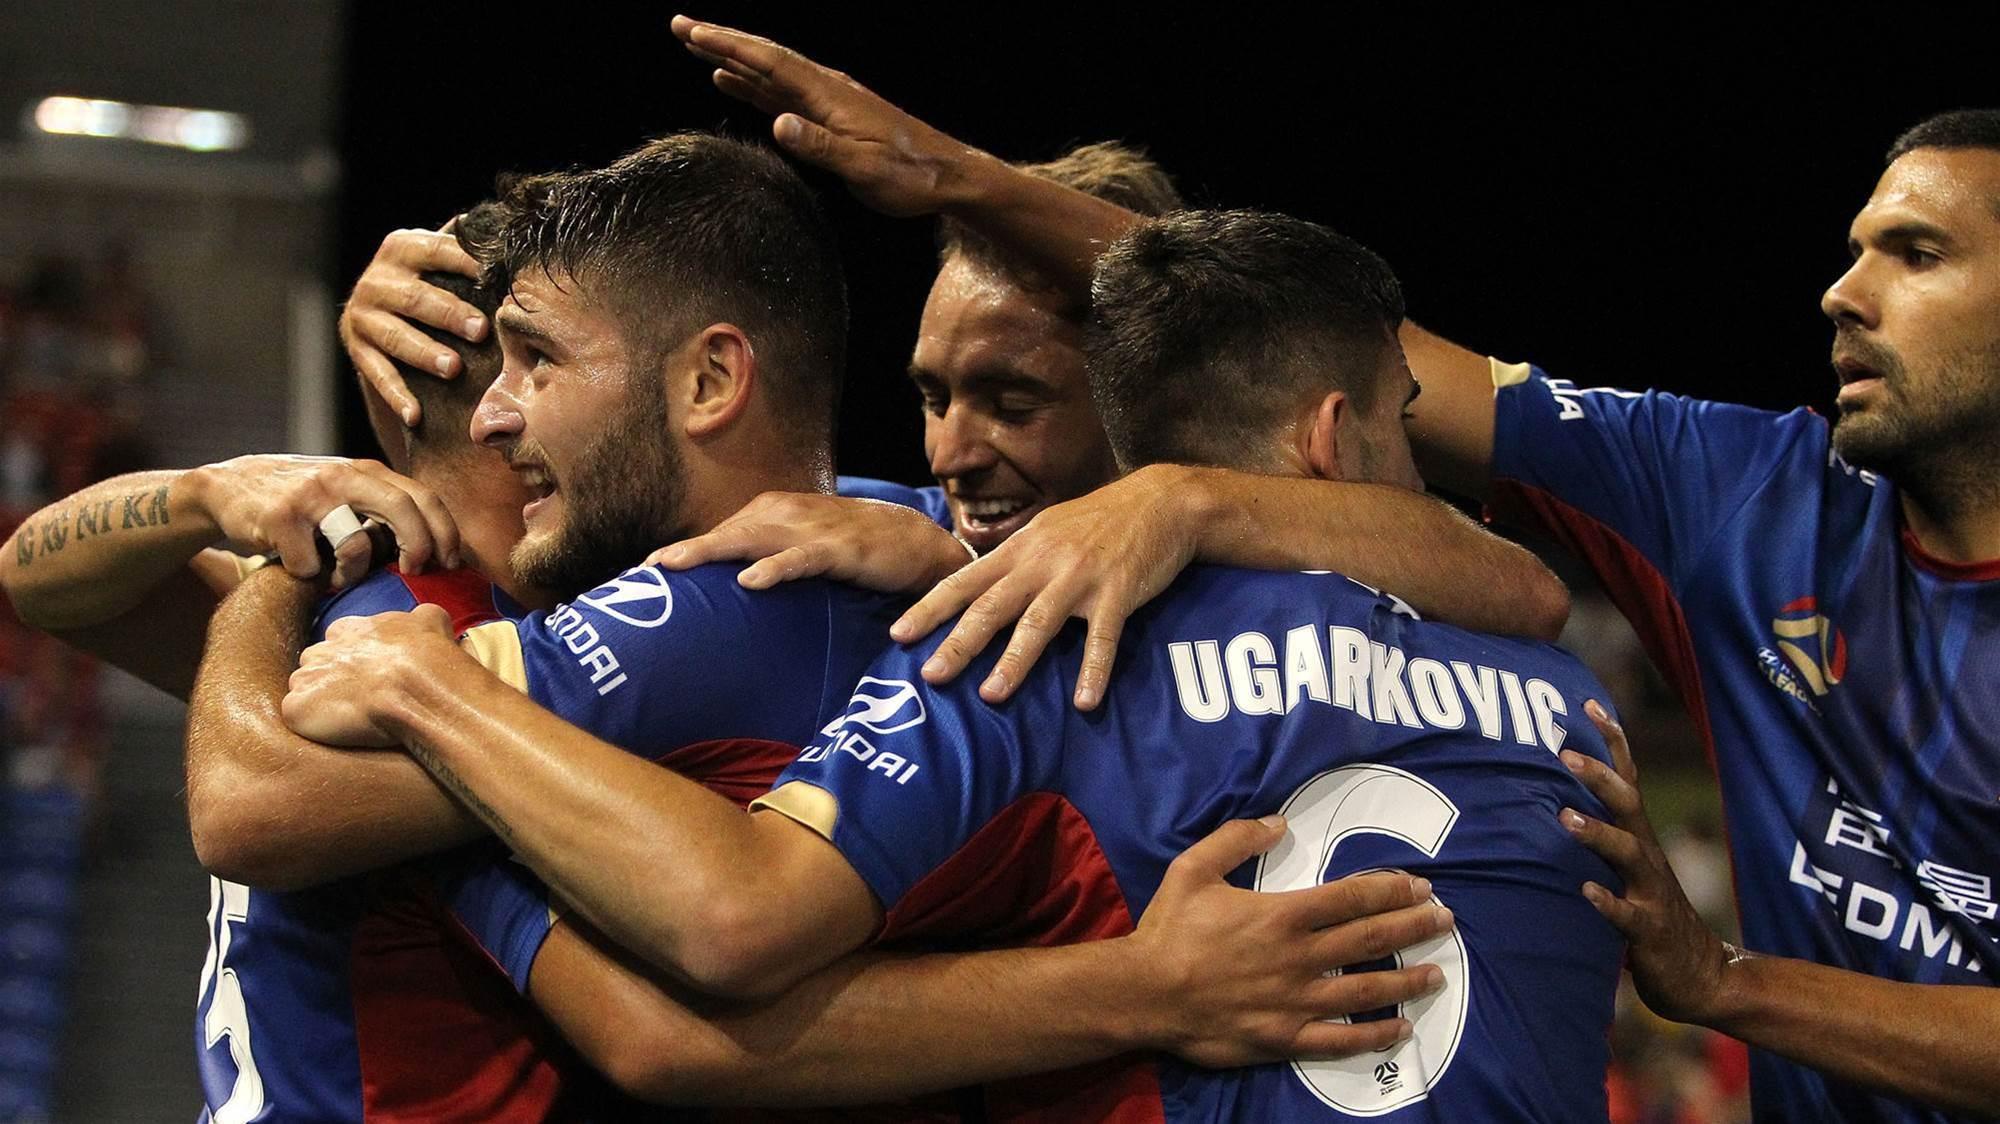 Newcastle Jets thrash Melbourne Victory - No more Mr Nice Guys